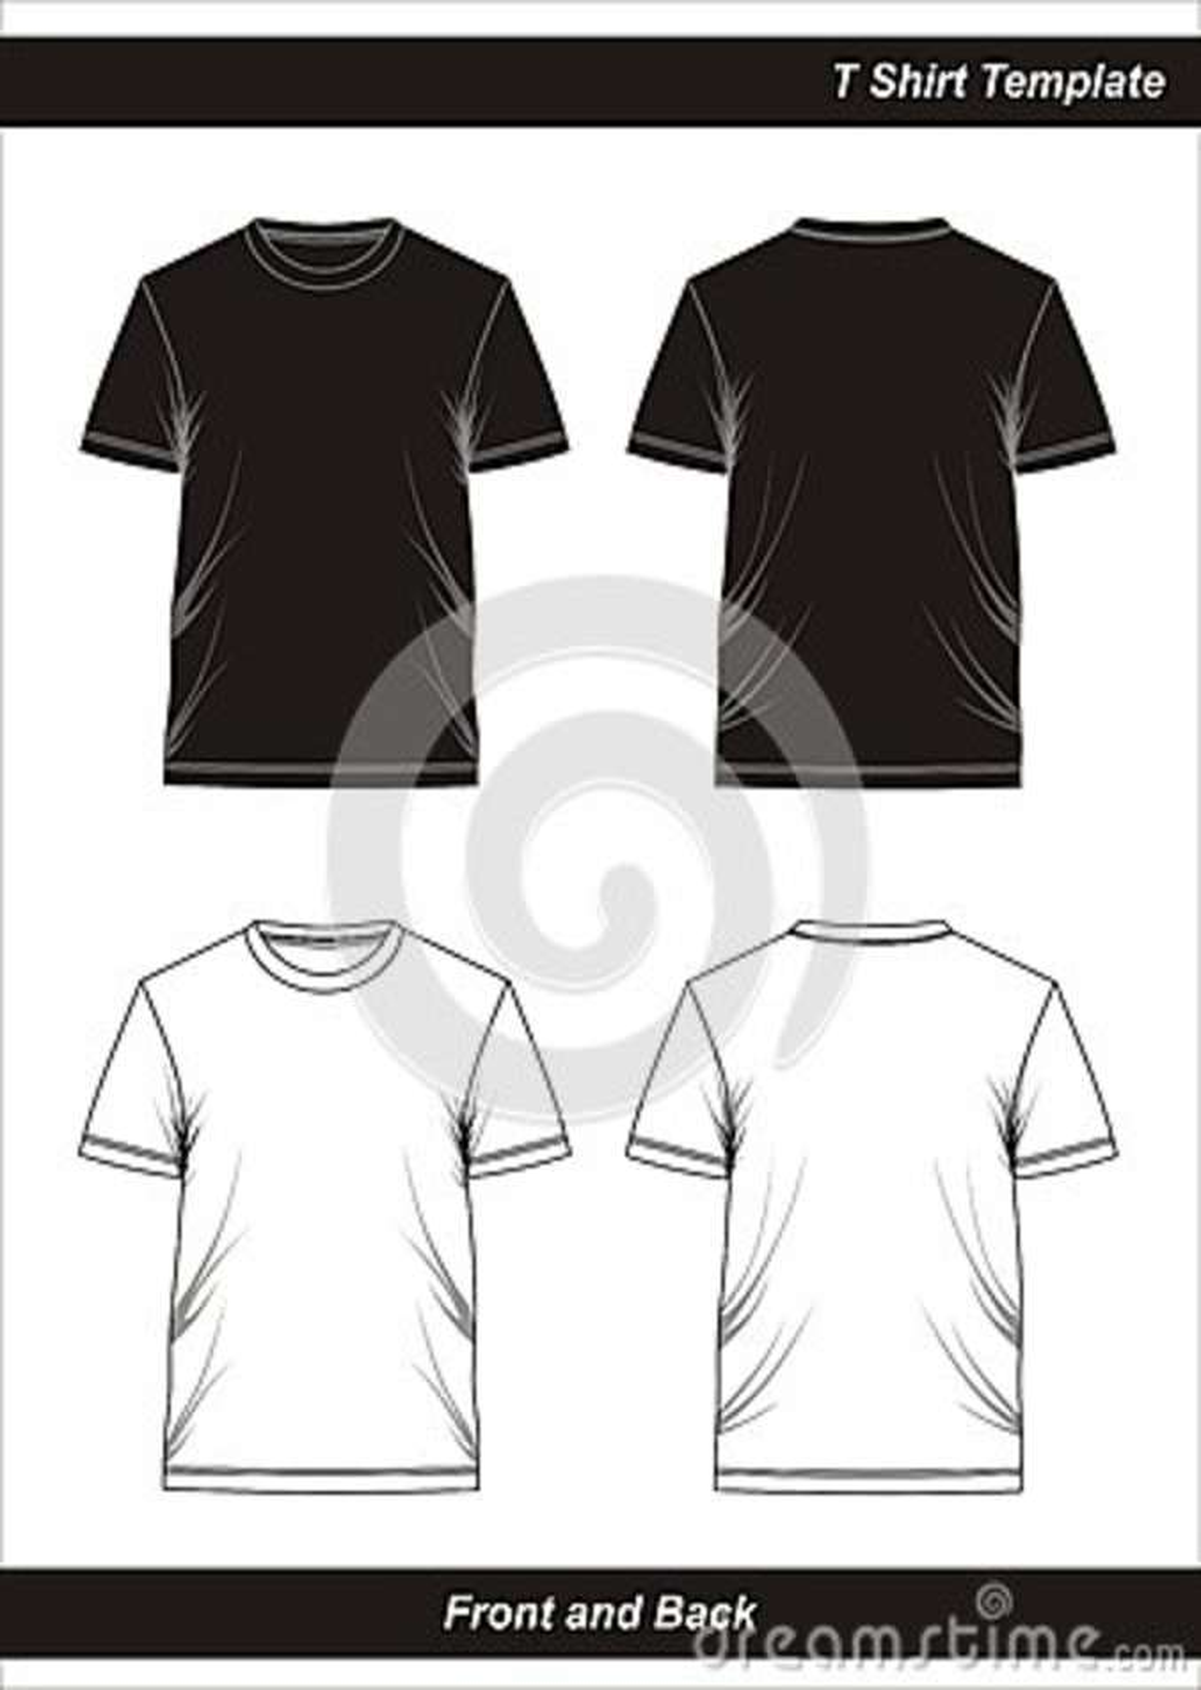 T Shirt Template Black White Blank Vector Image